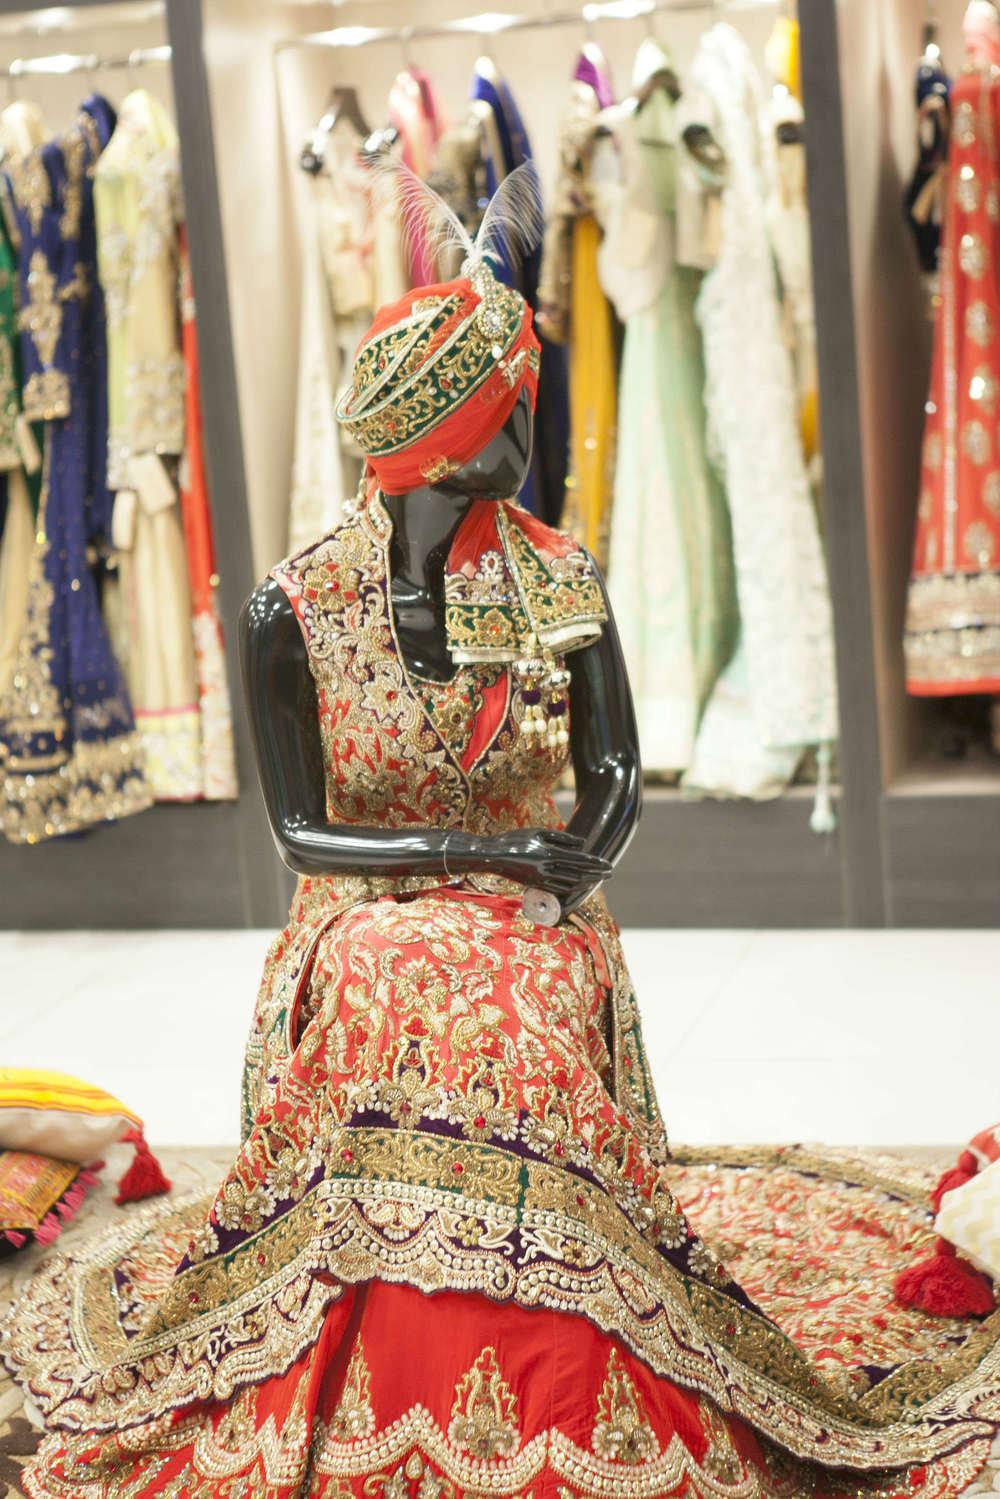 Shop Interior - fashion.jpg